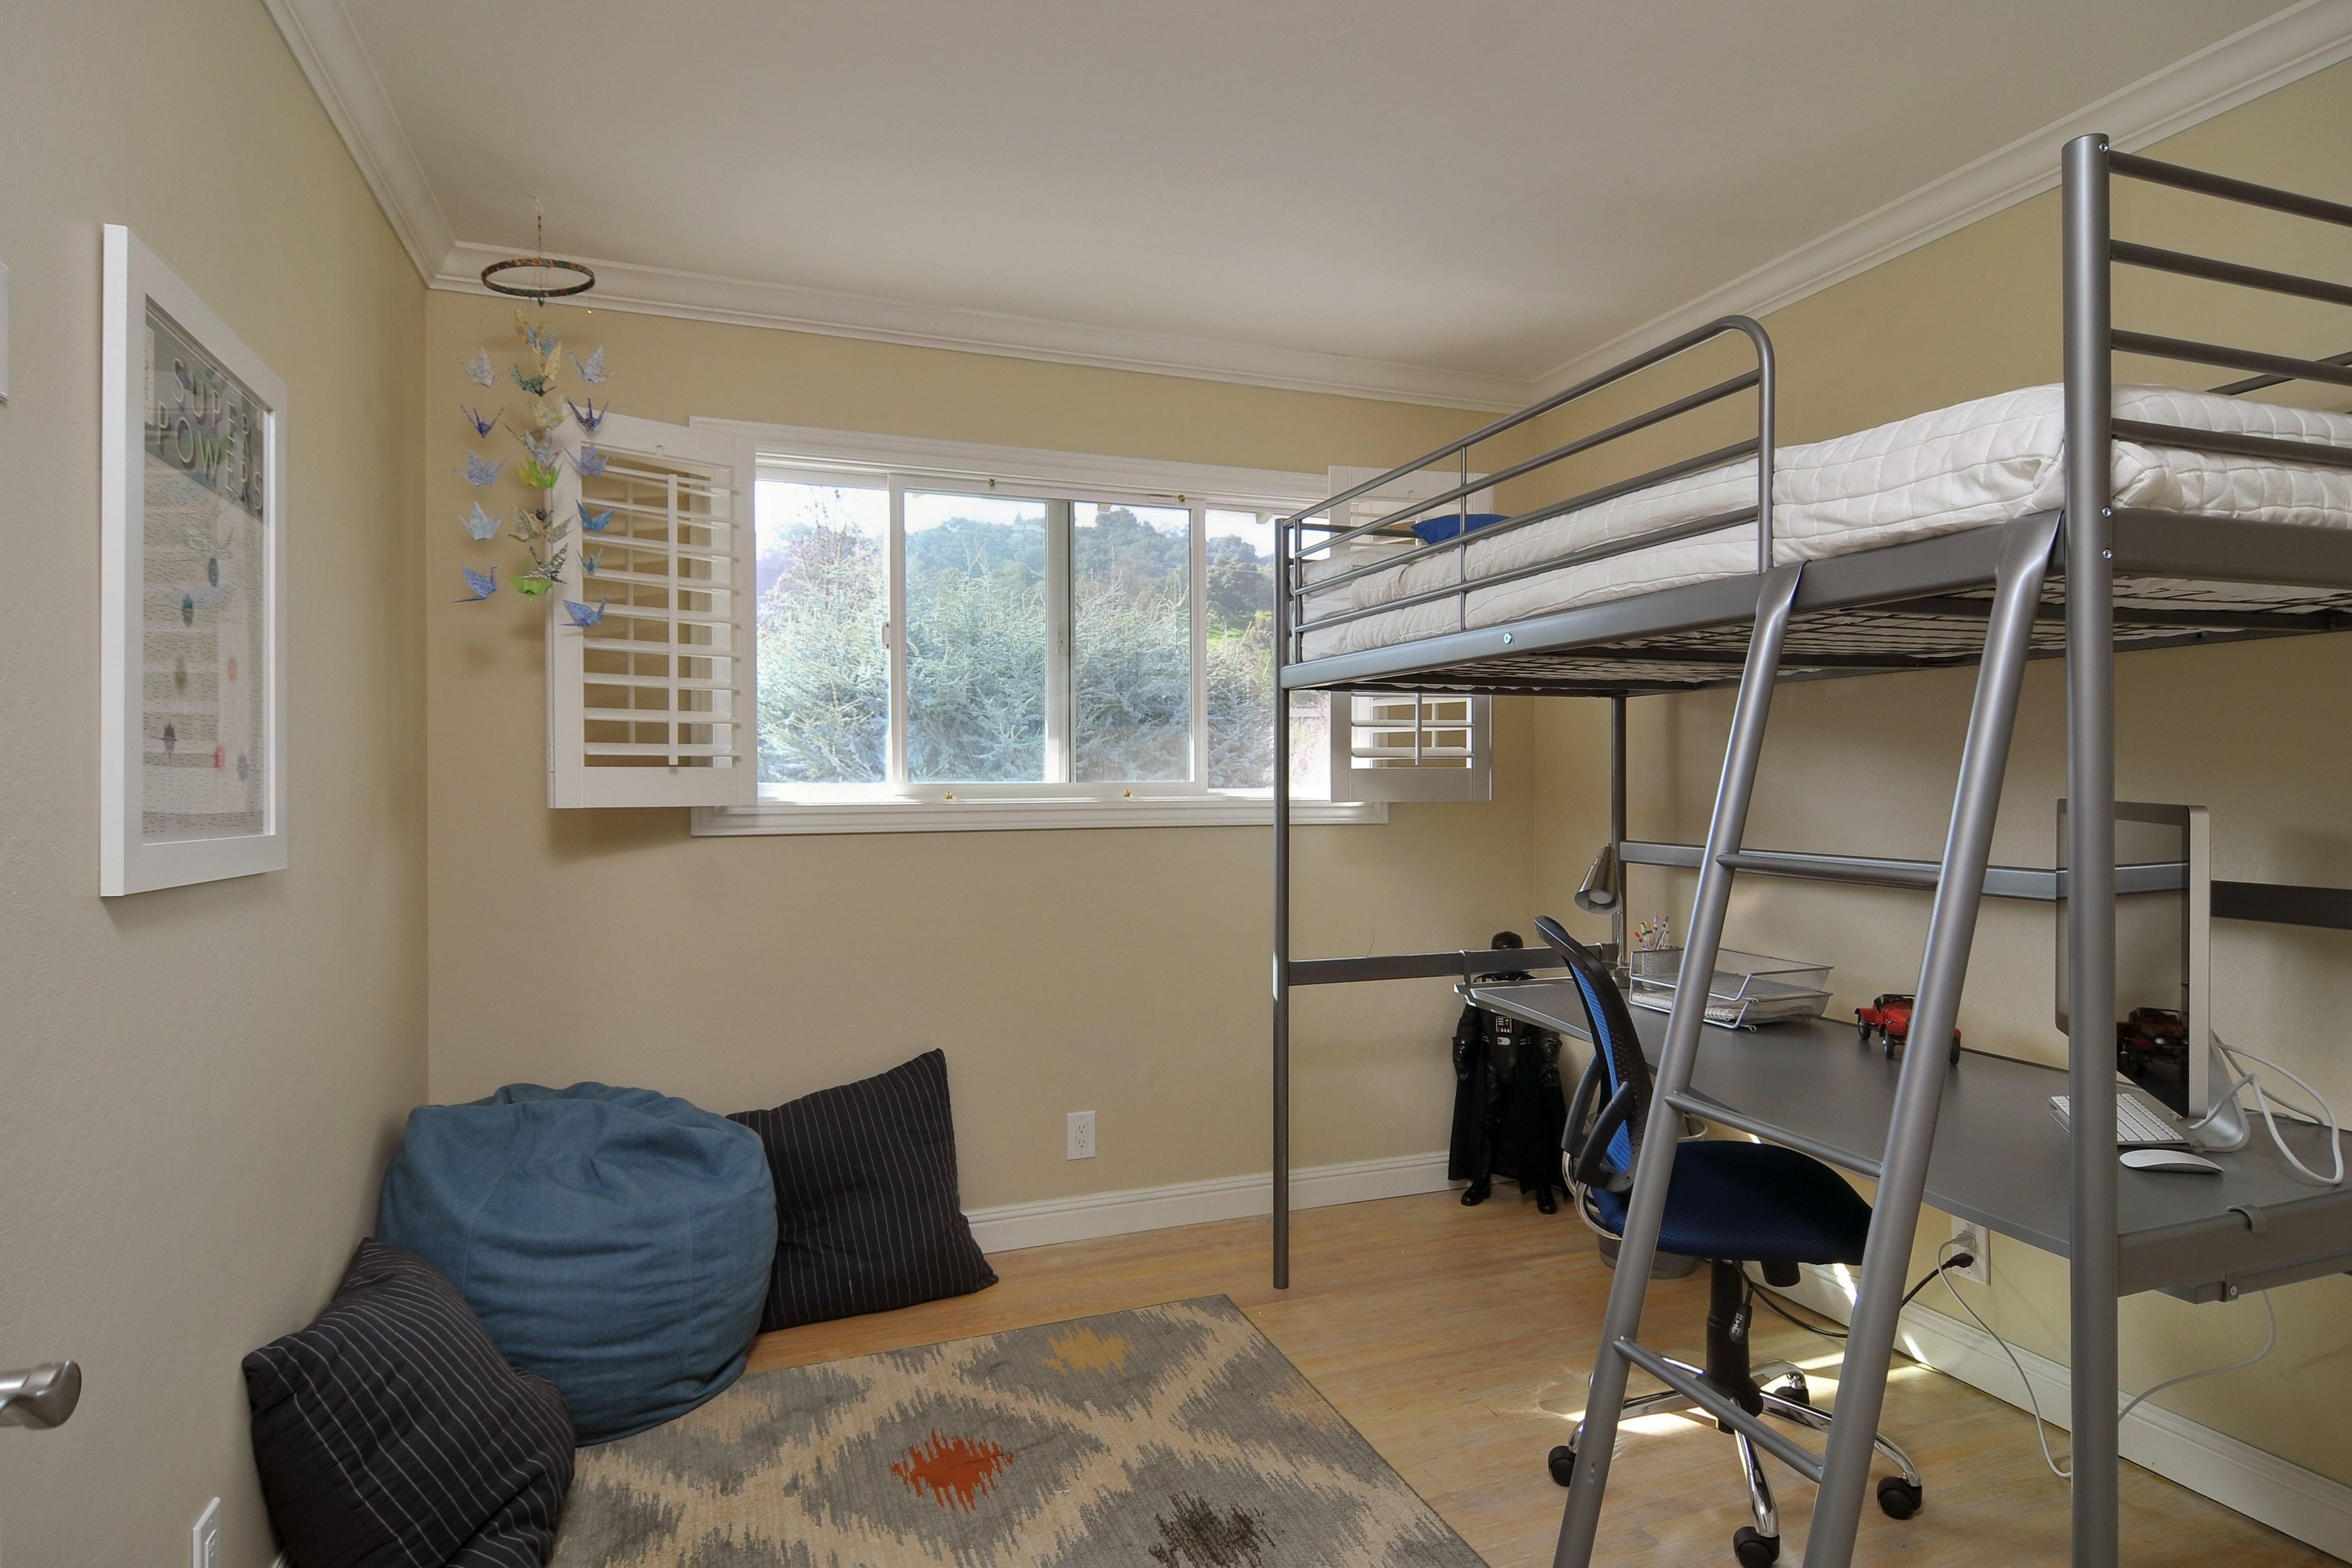 018 Bedroom 2 - Exquisite, expansive, remodeled Belwood home - 127 Belhaven Drive, Los Gatos